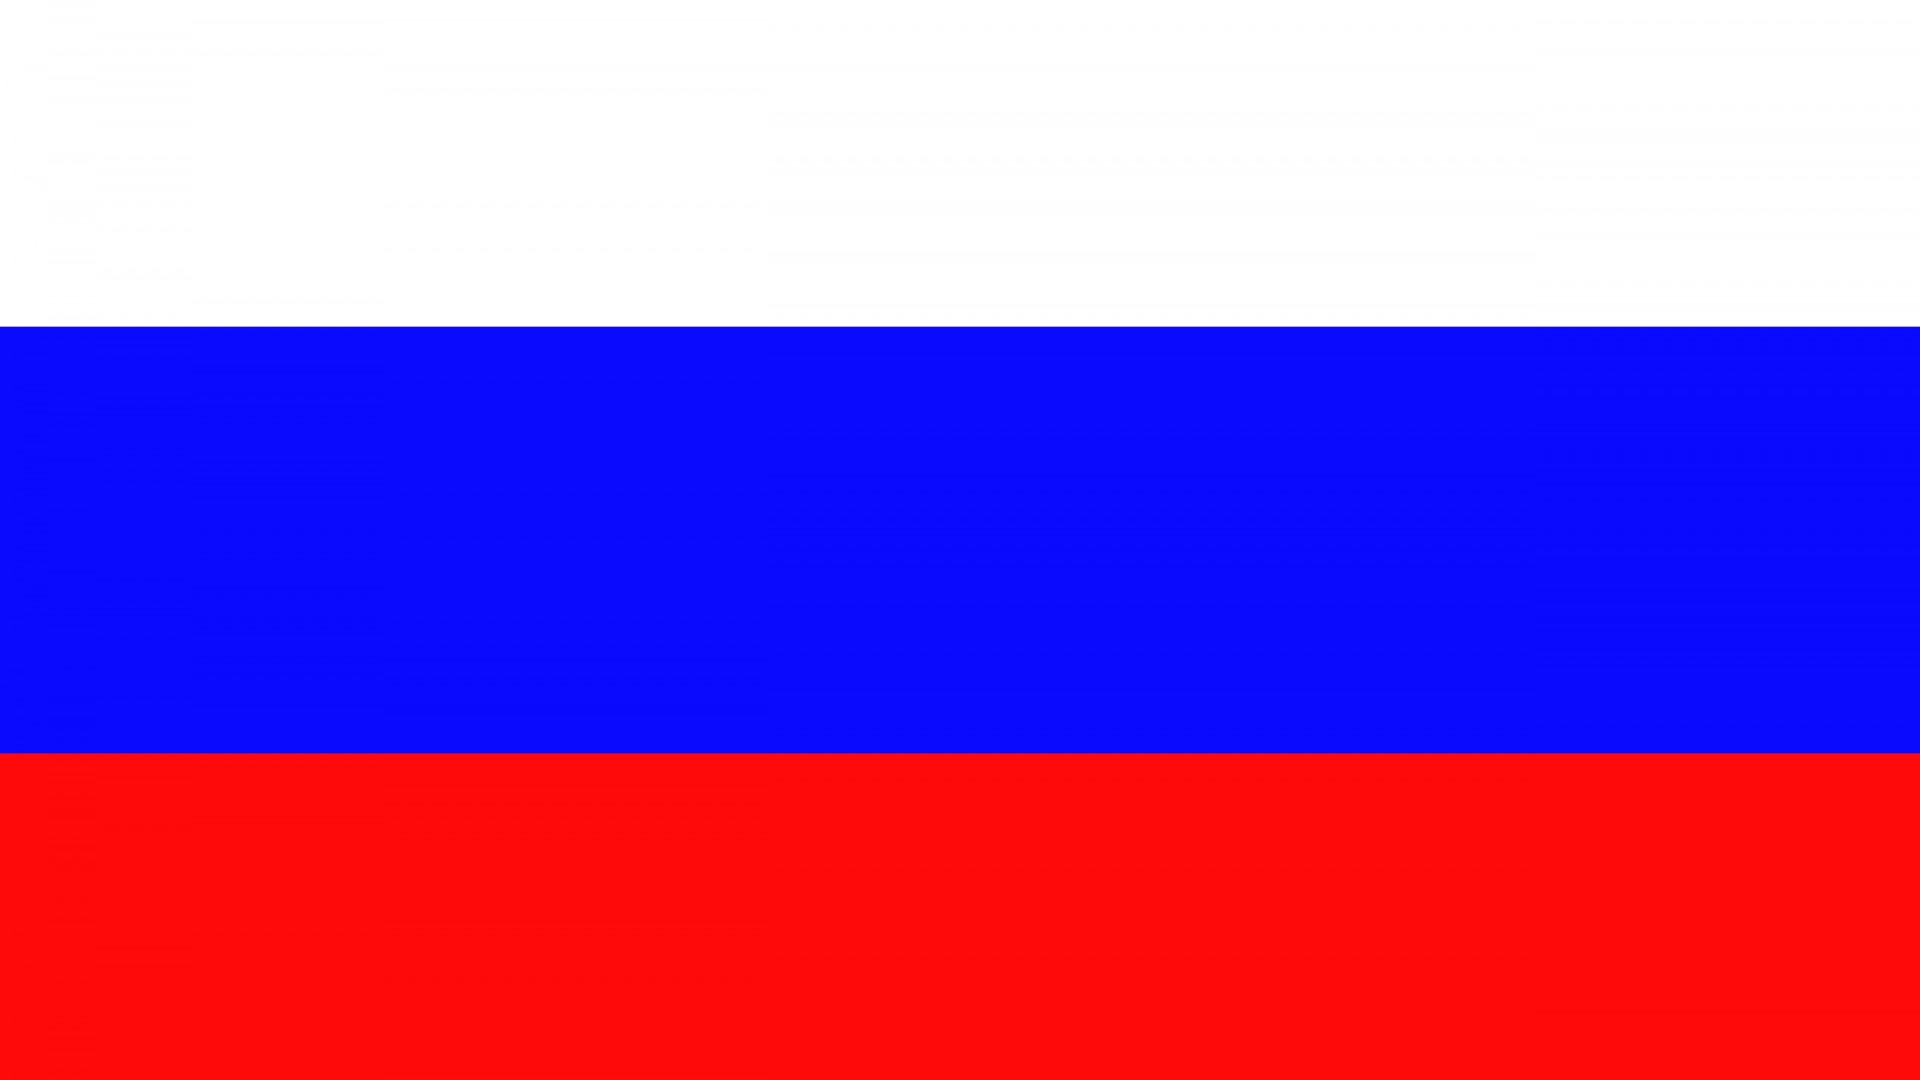 флаг россия flag Russia  № 2343650 без смс